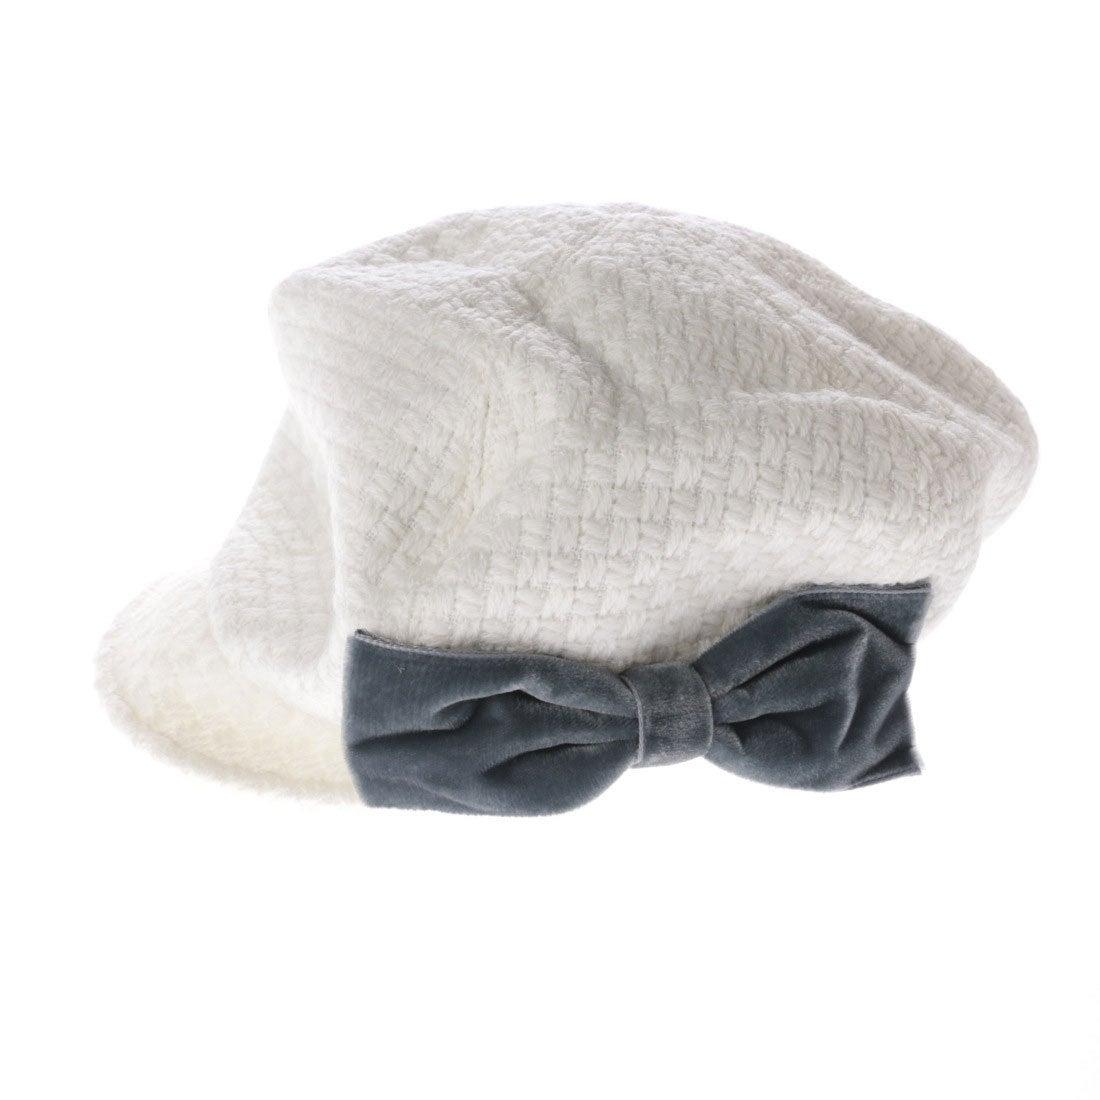 【SALE 70%OFF】セレク コレクション CELEC COLLECTION りぼんキャスケット帽子 (オフホワイト)